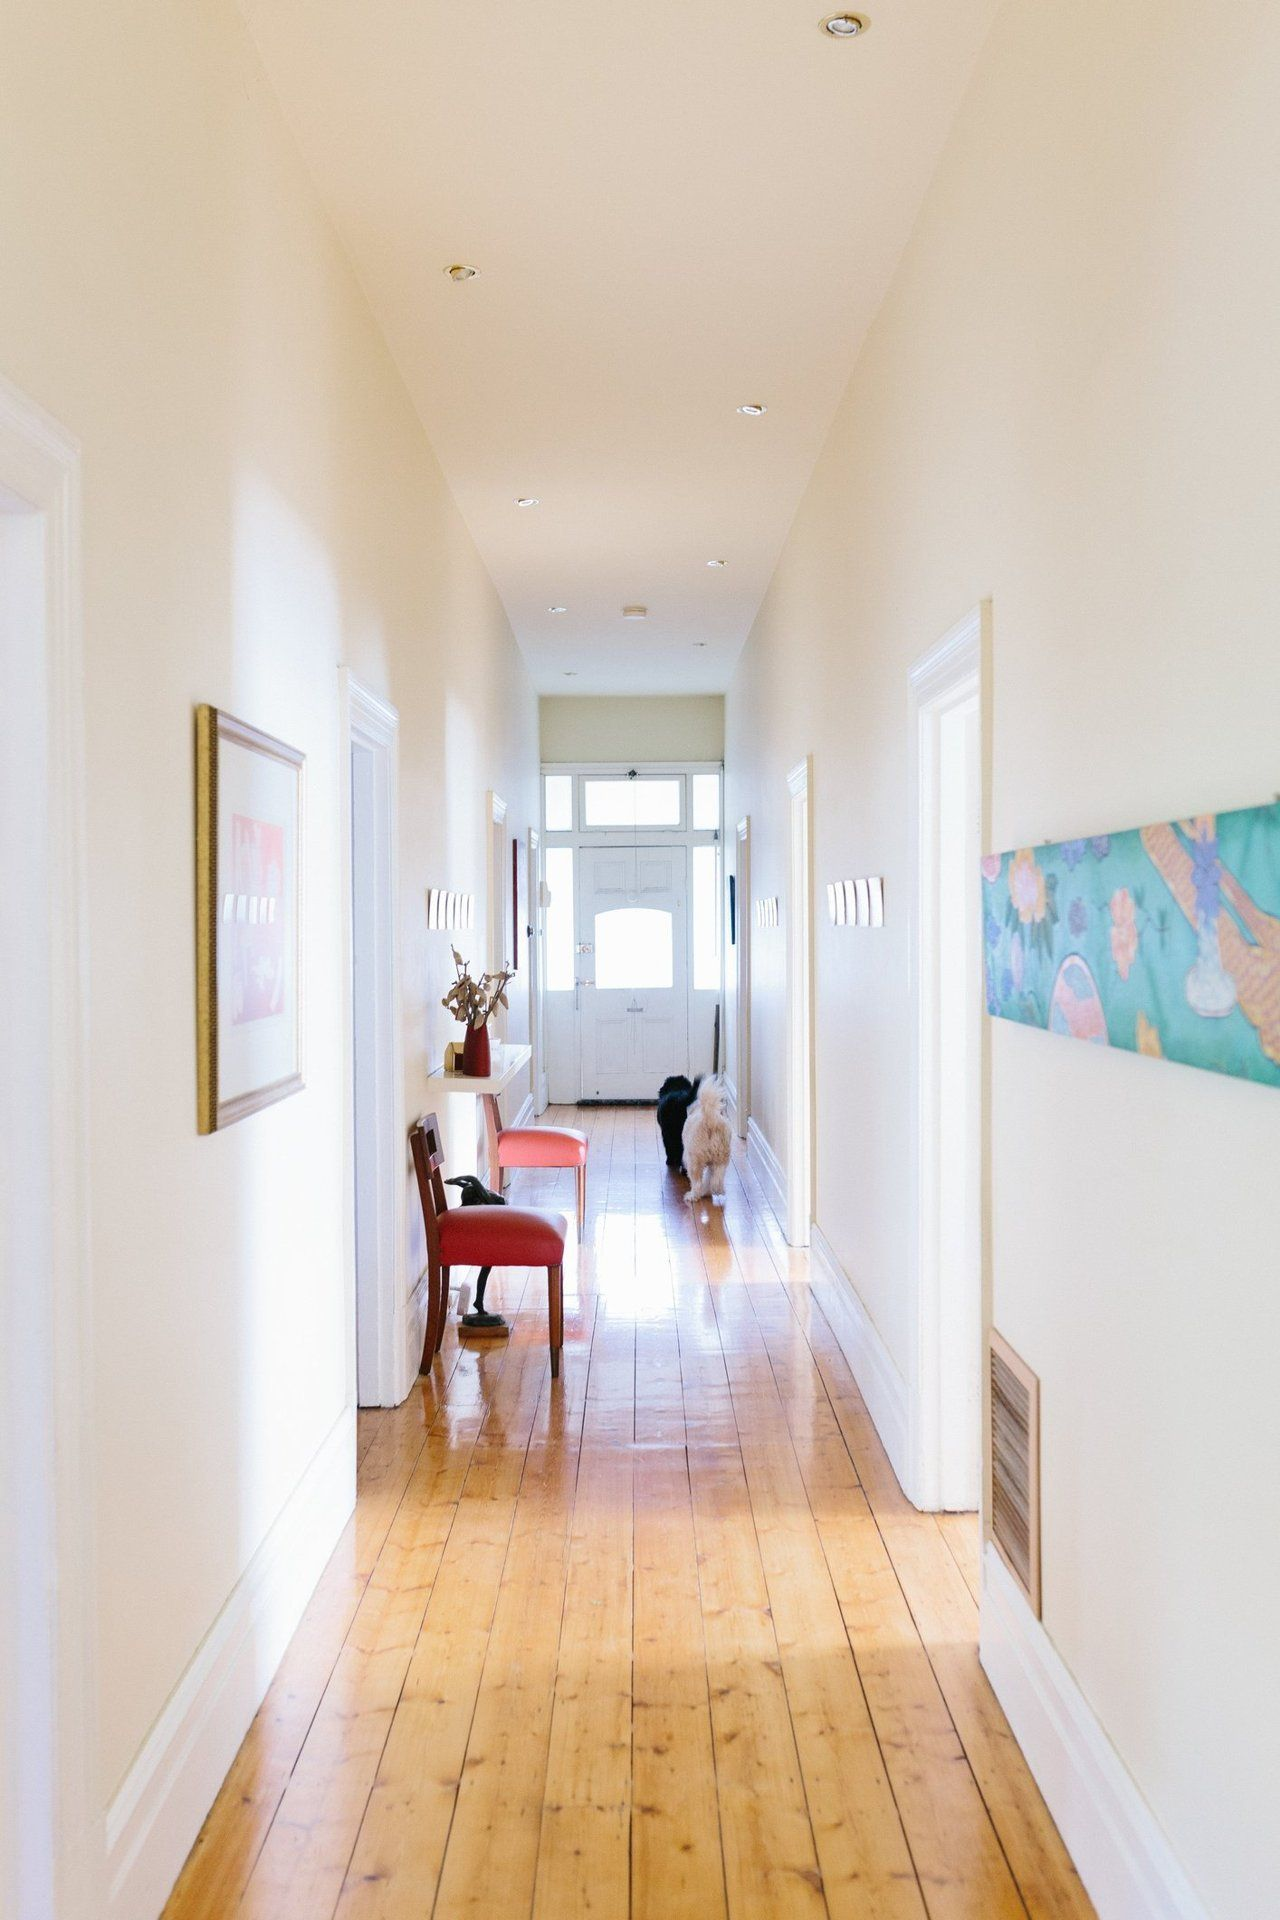 House Tour: An Eclectic Australian Home | Long hallway, Apartment ...